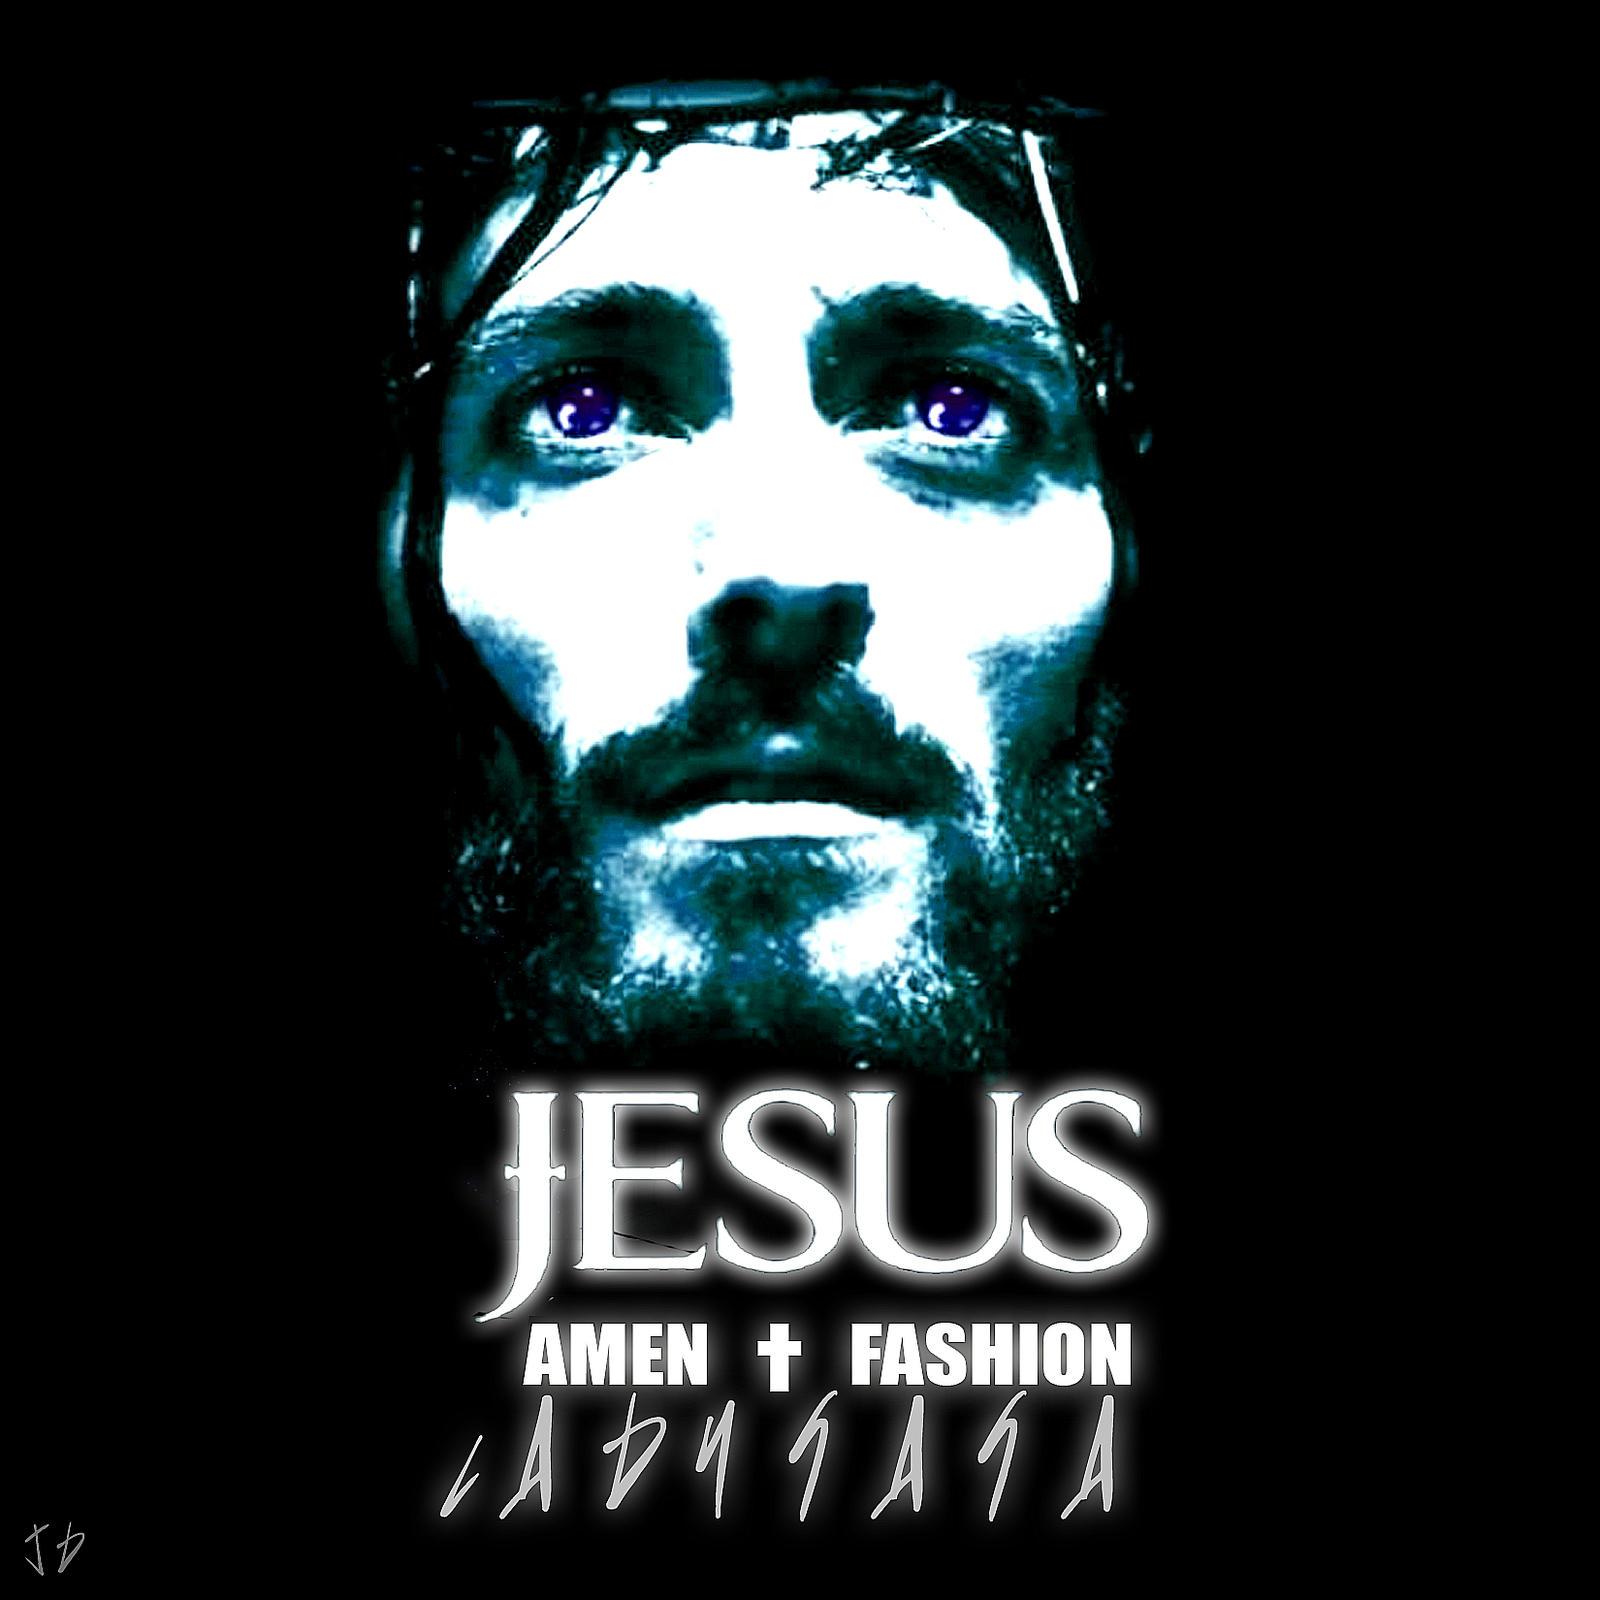 Black jesus amen fashion lyrics 84